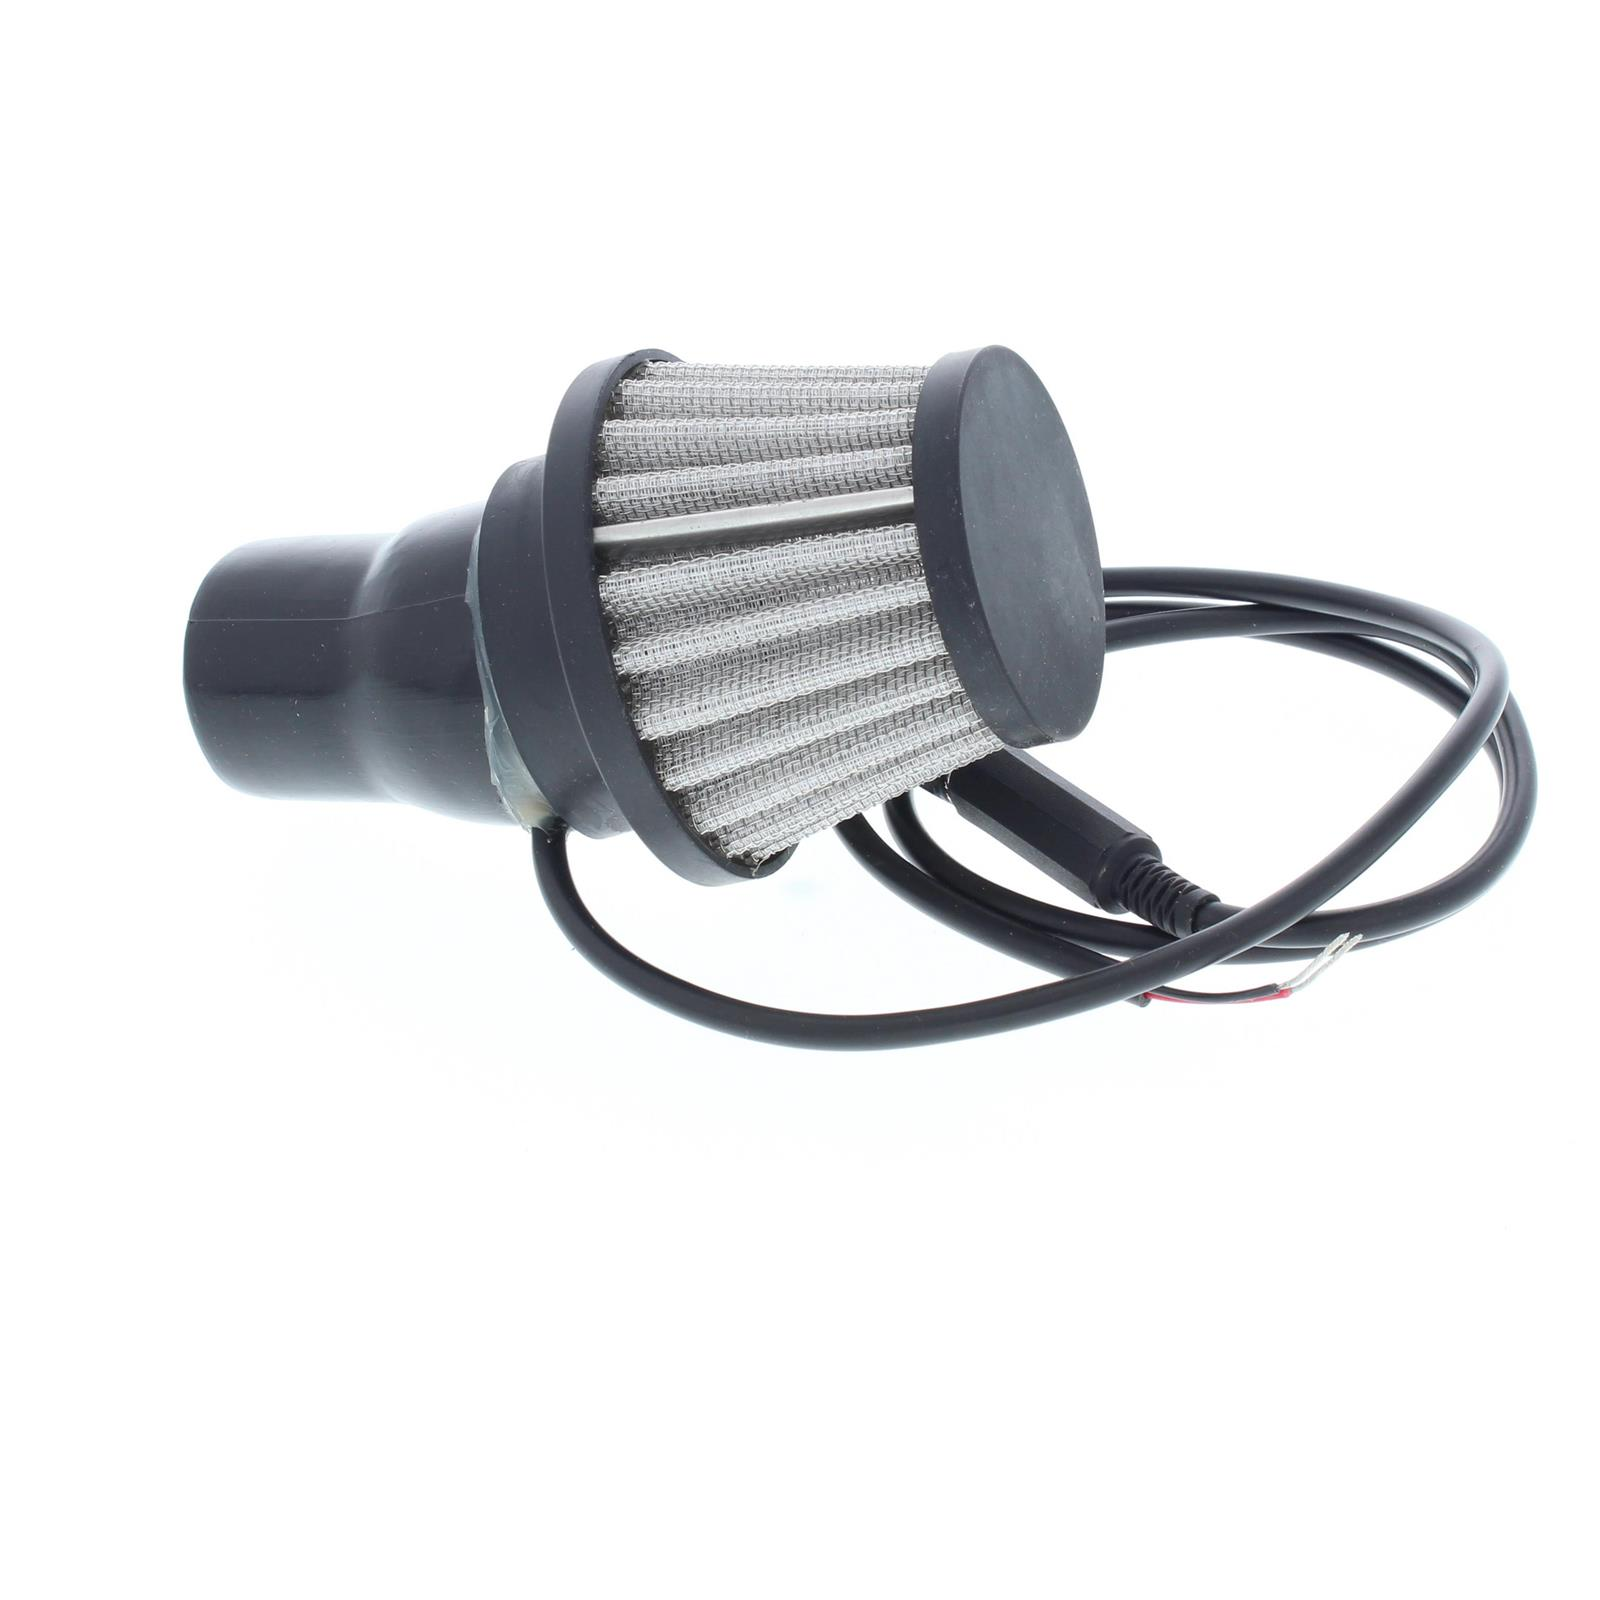 Speedway Tru-Air Mini Pumper Racing Helmet Pump Blower Breather